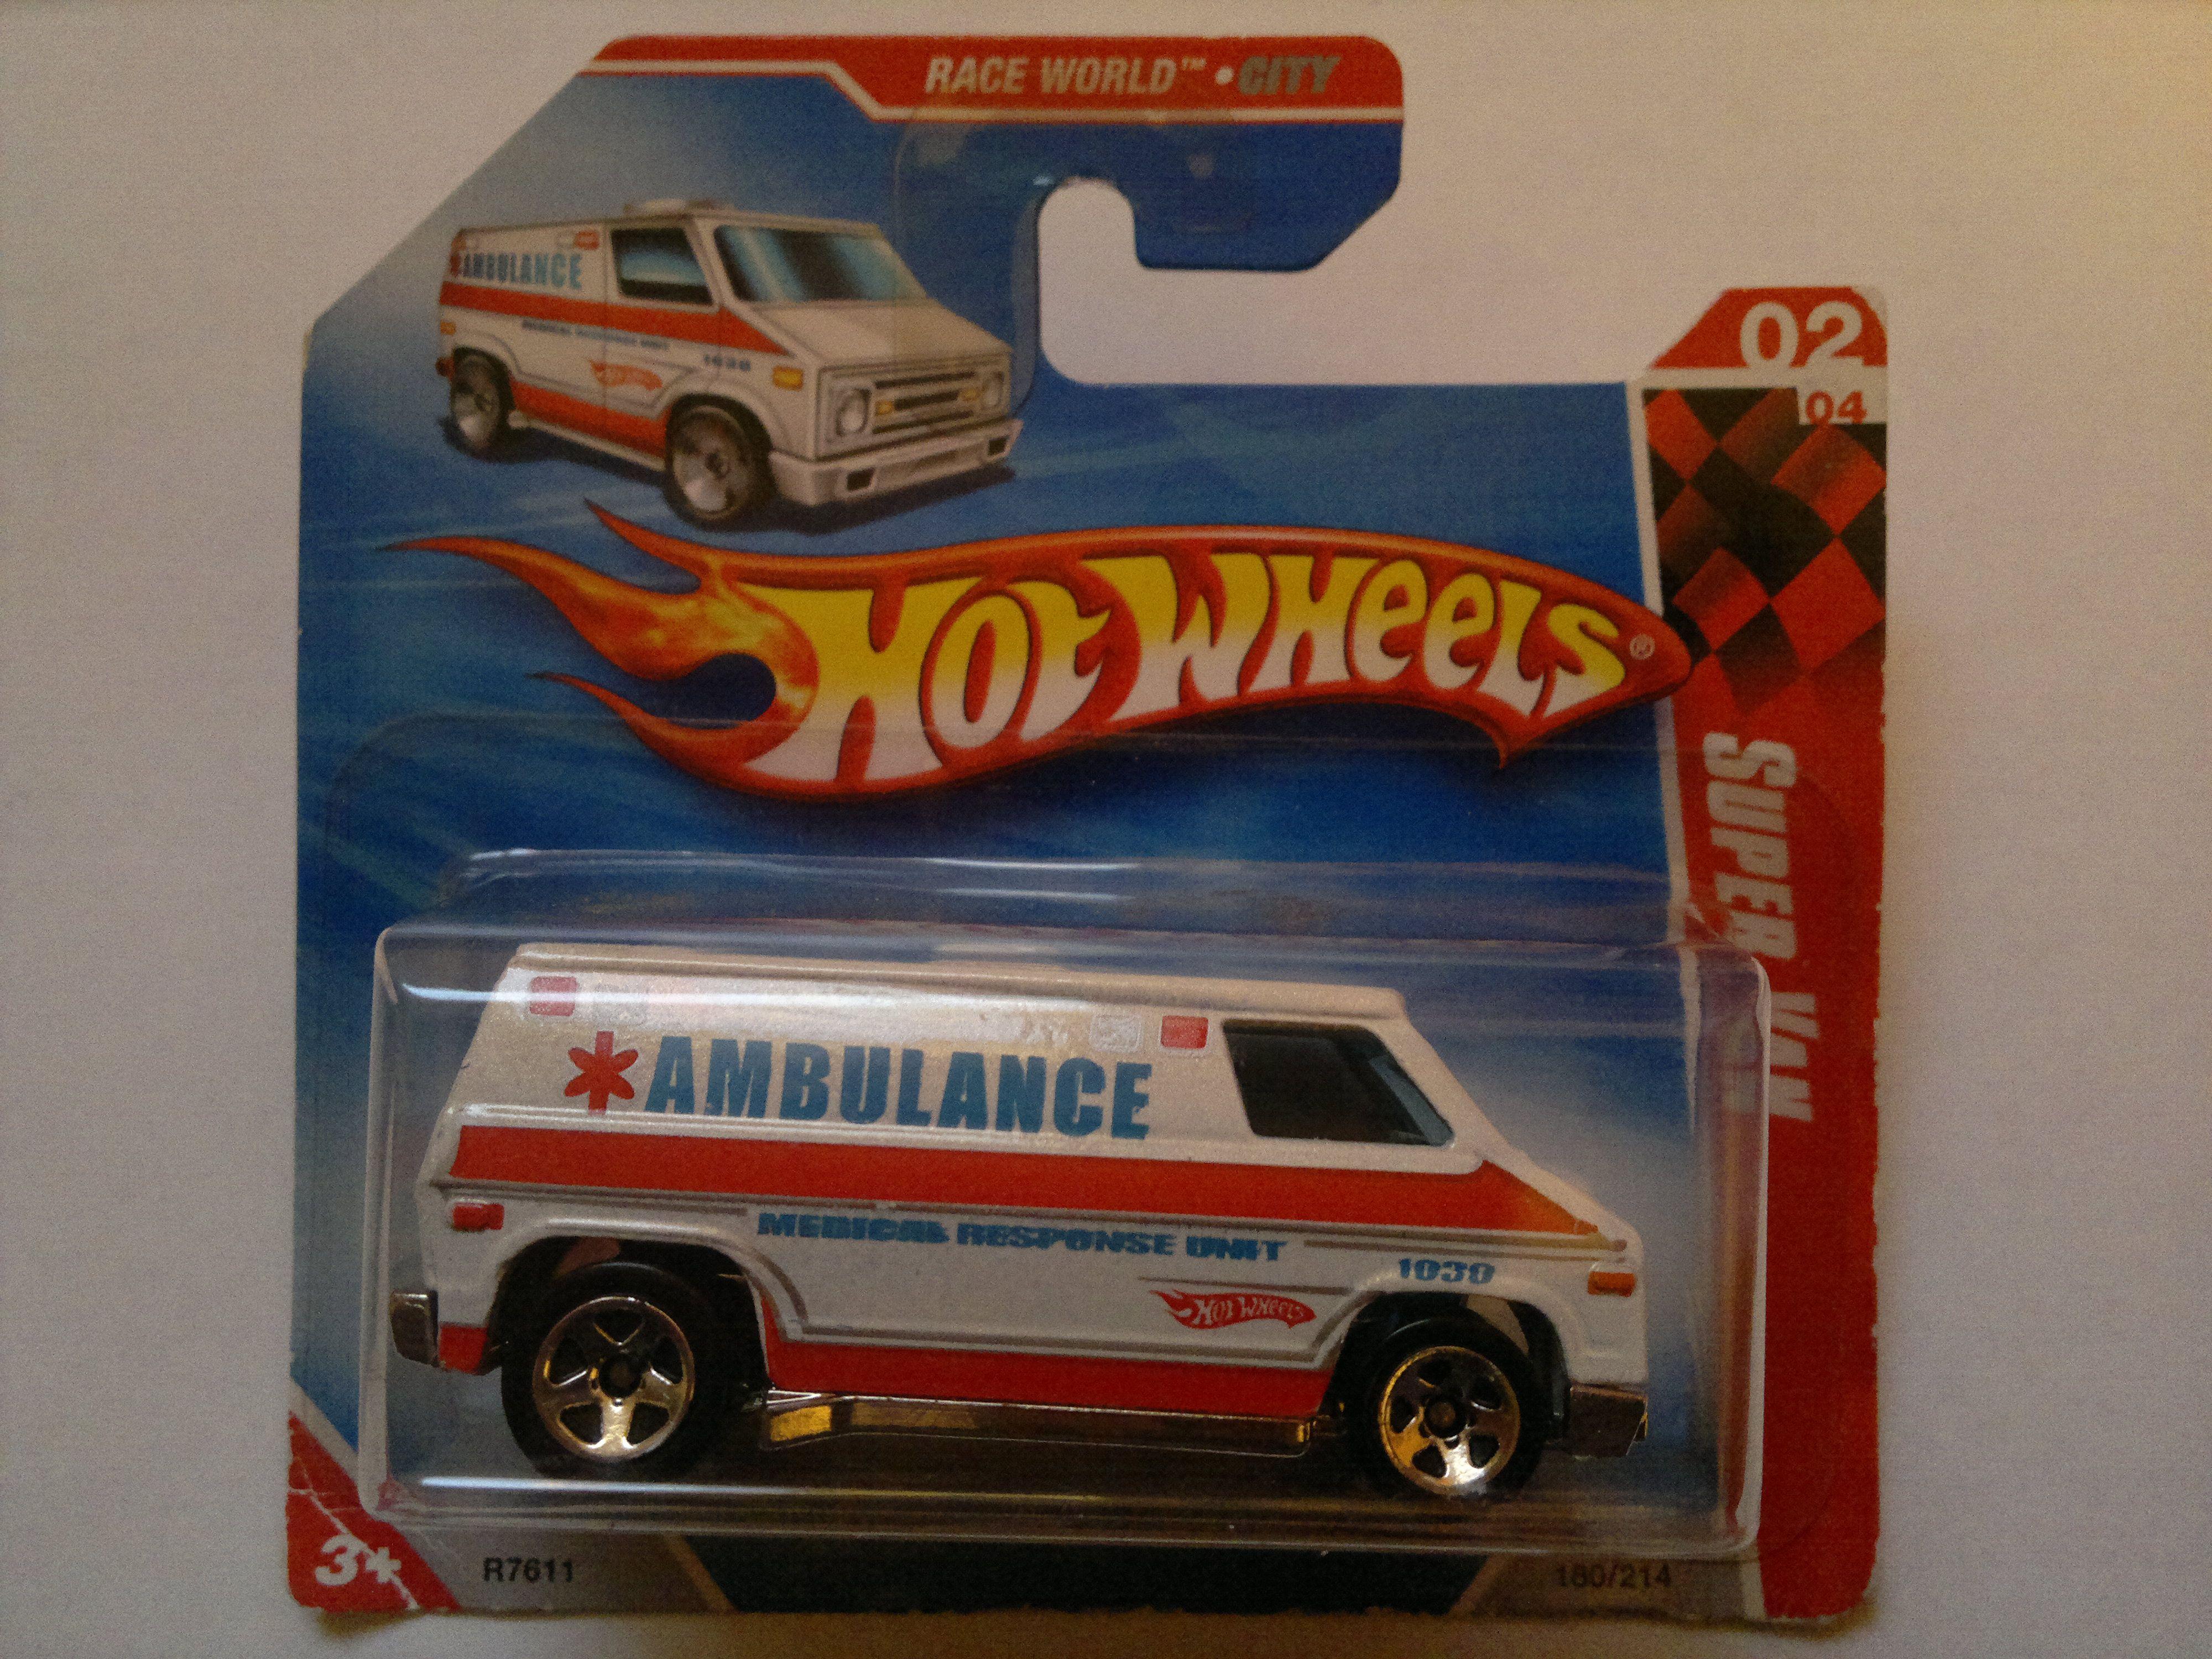 Hot wheels redline the heavyweights ambulance 1969 hong kong gotta have it hotwheels hotwheelsredlinetheheavyweightsambulance1969 pinterest wheels